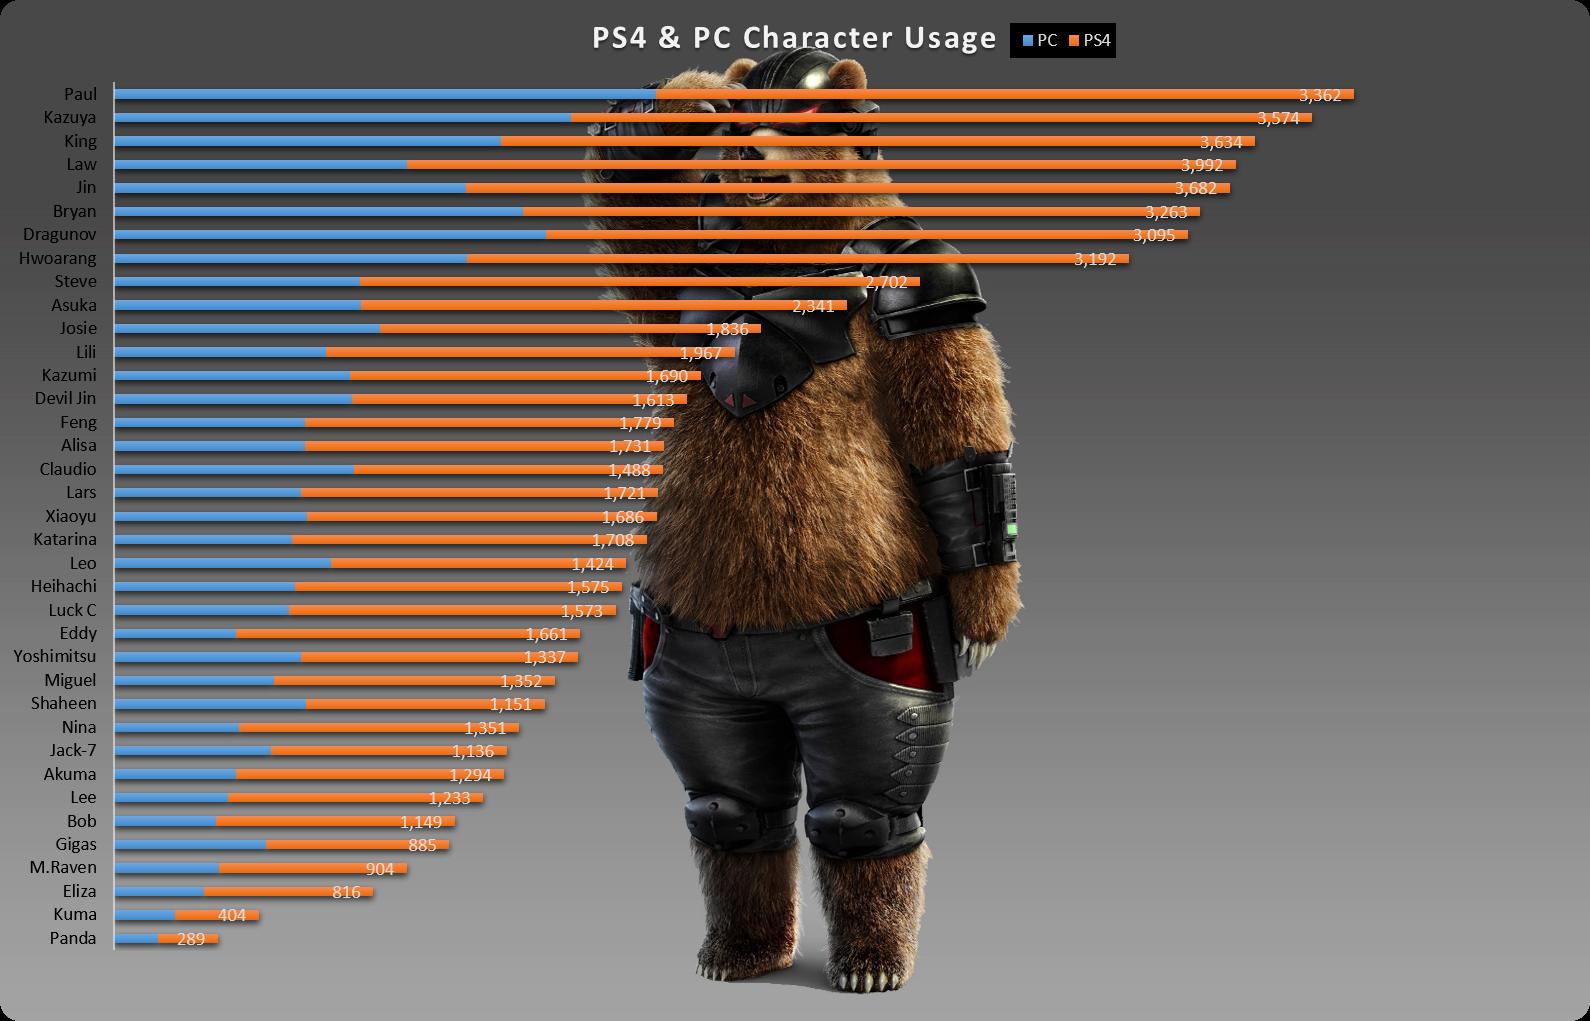 Ps4 Pc Tekken 7 World Character Usage Rank Distribution Charts News Avoiding The Puddle